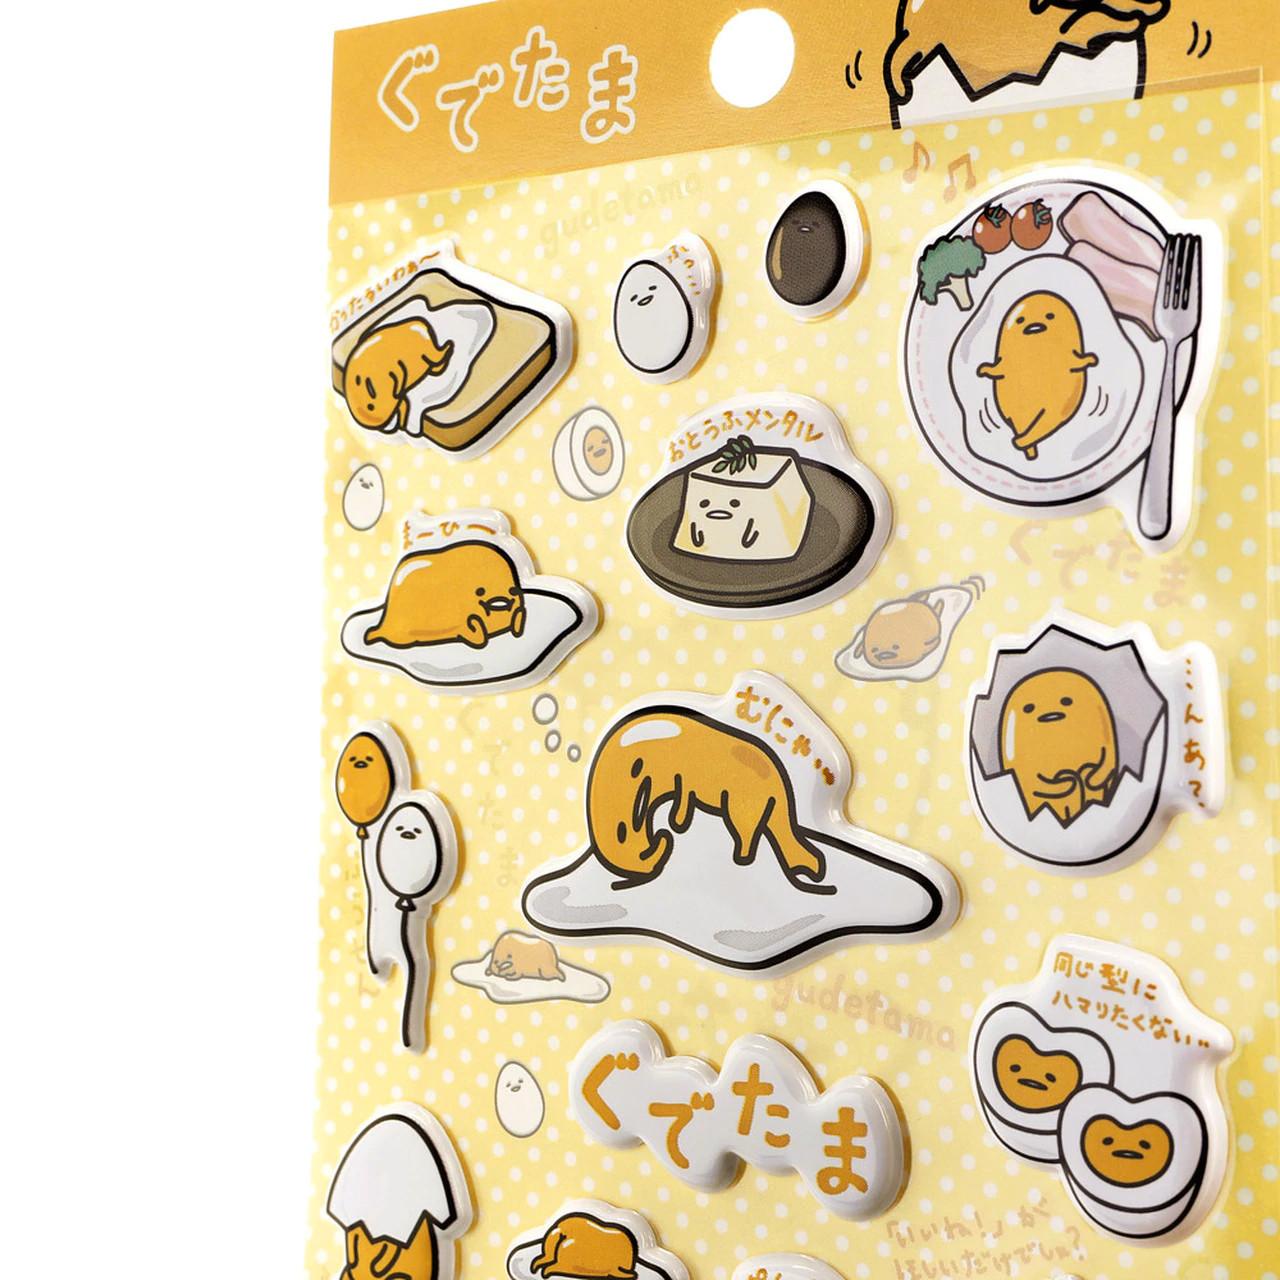 Sanrio Gudetama Lazy Egg Breakfast Series 3D Bulge Stationery Sticker ( Close Up 01 )